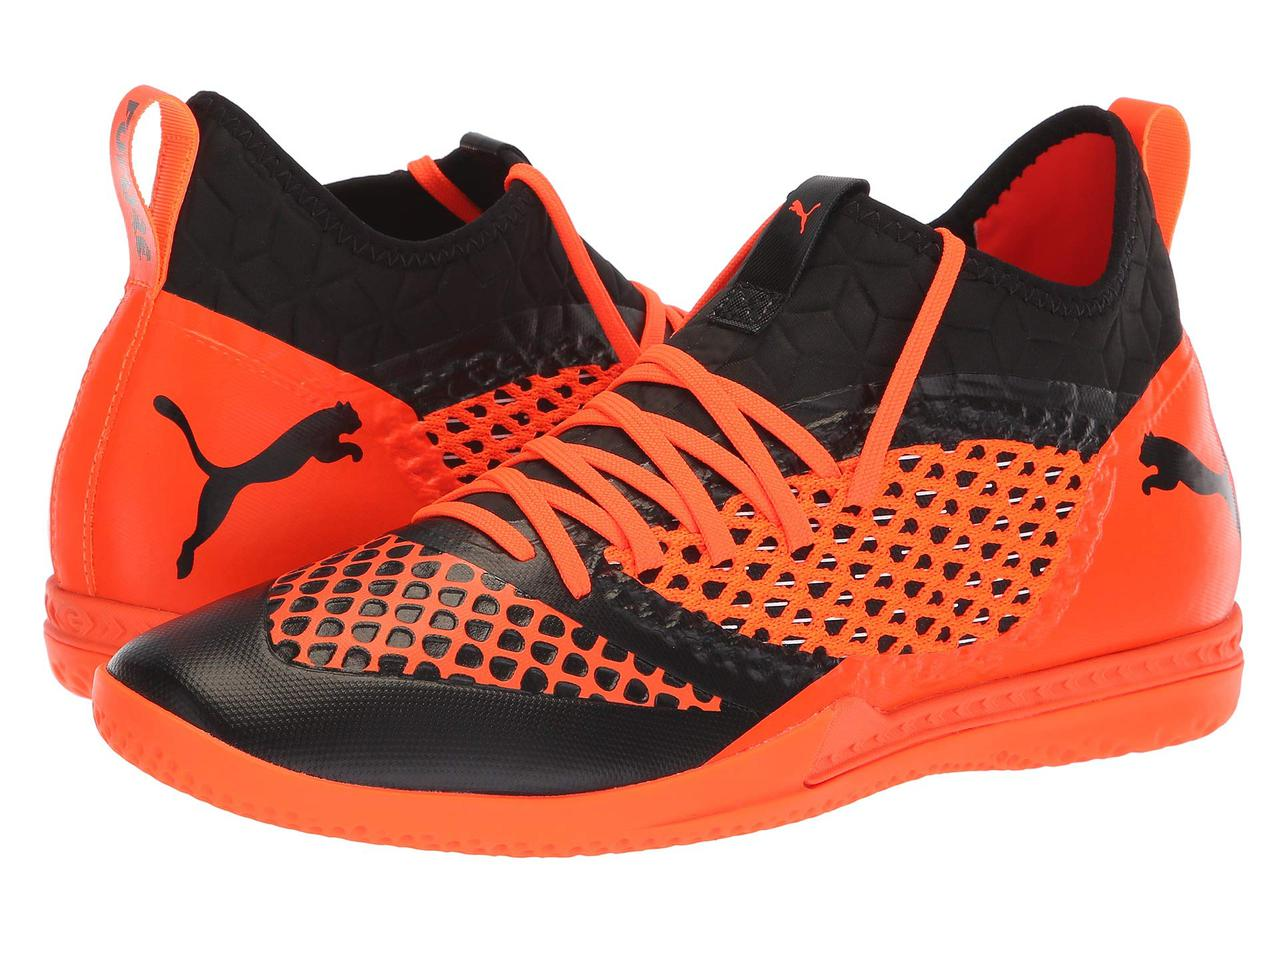 Кроссовки Кеды (Оригинал) PUMA Future 2.3 Netfit IT Puma Black Shocking  Orange 3780cf5849bf4